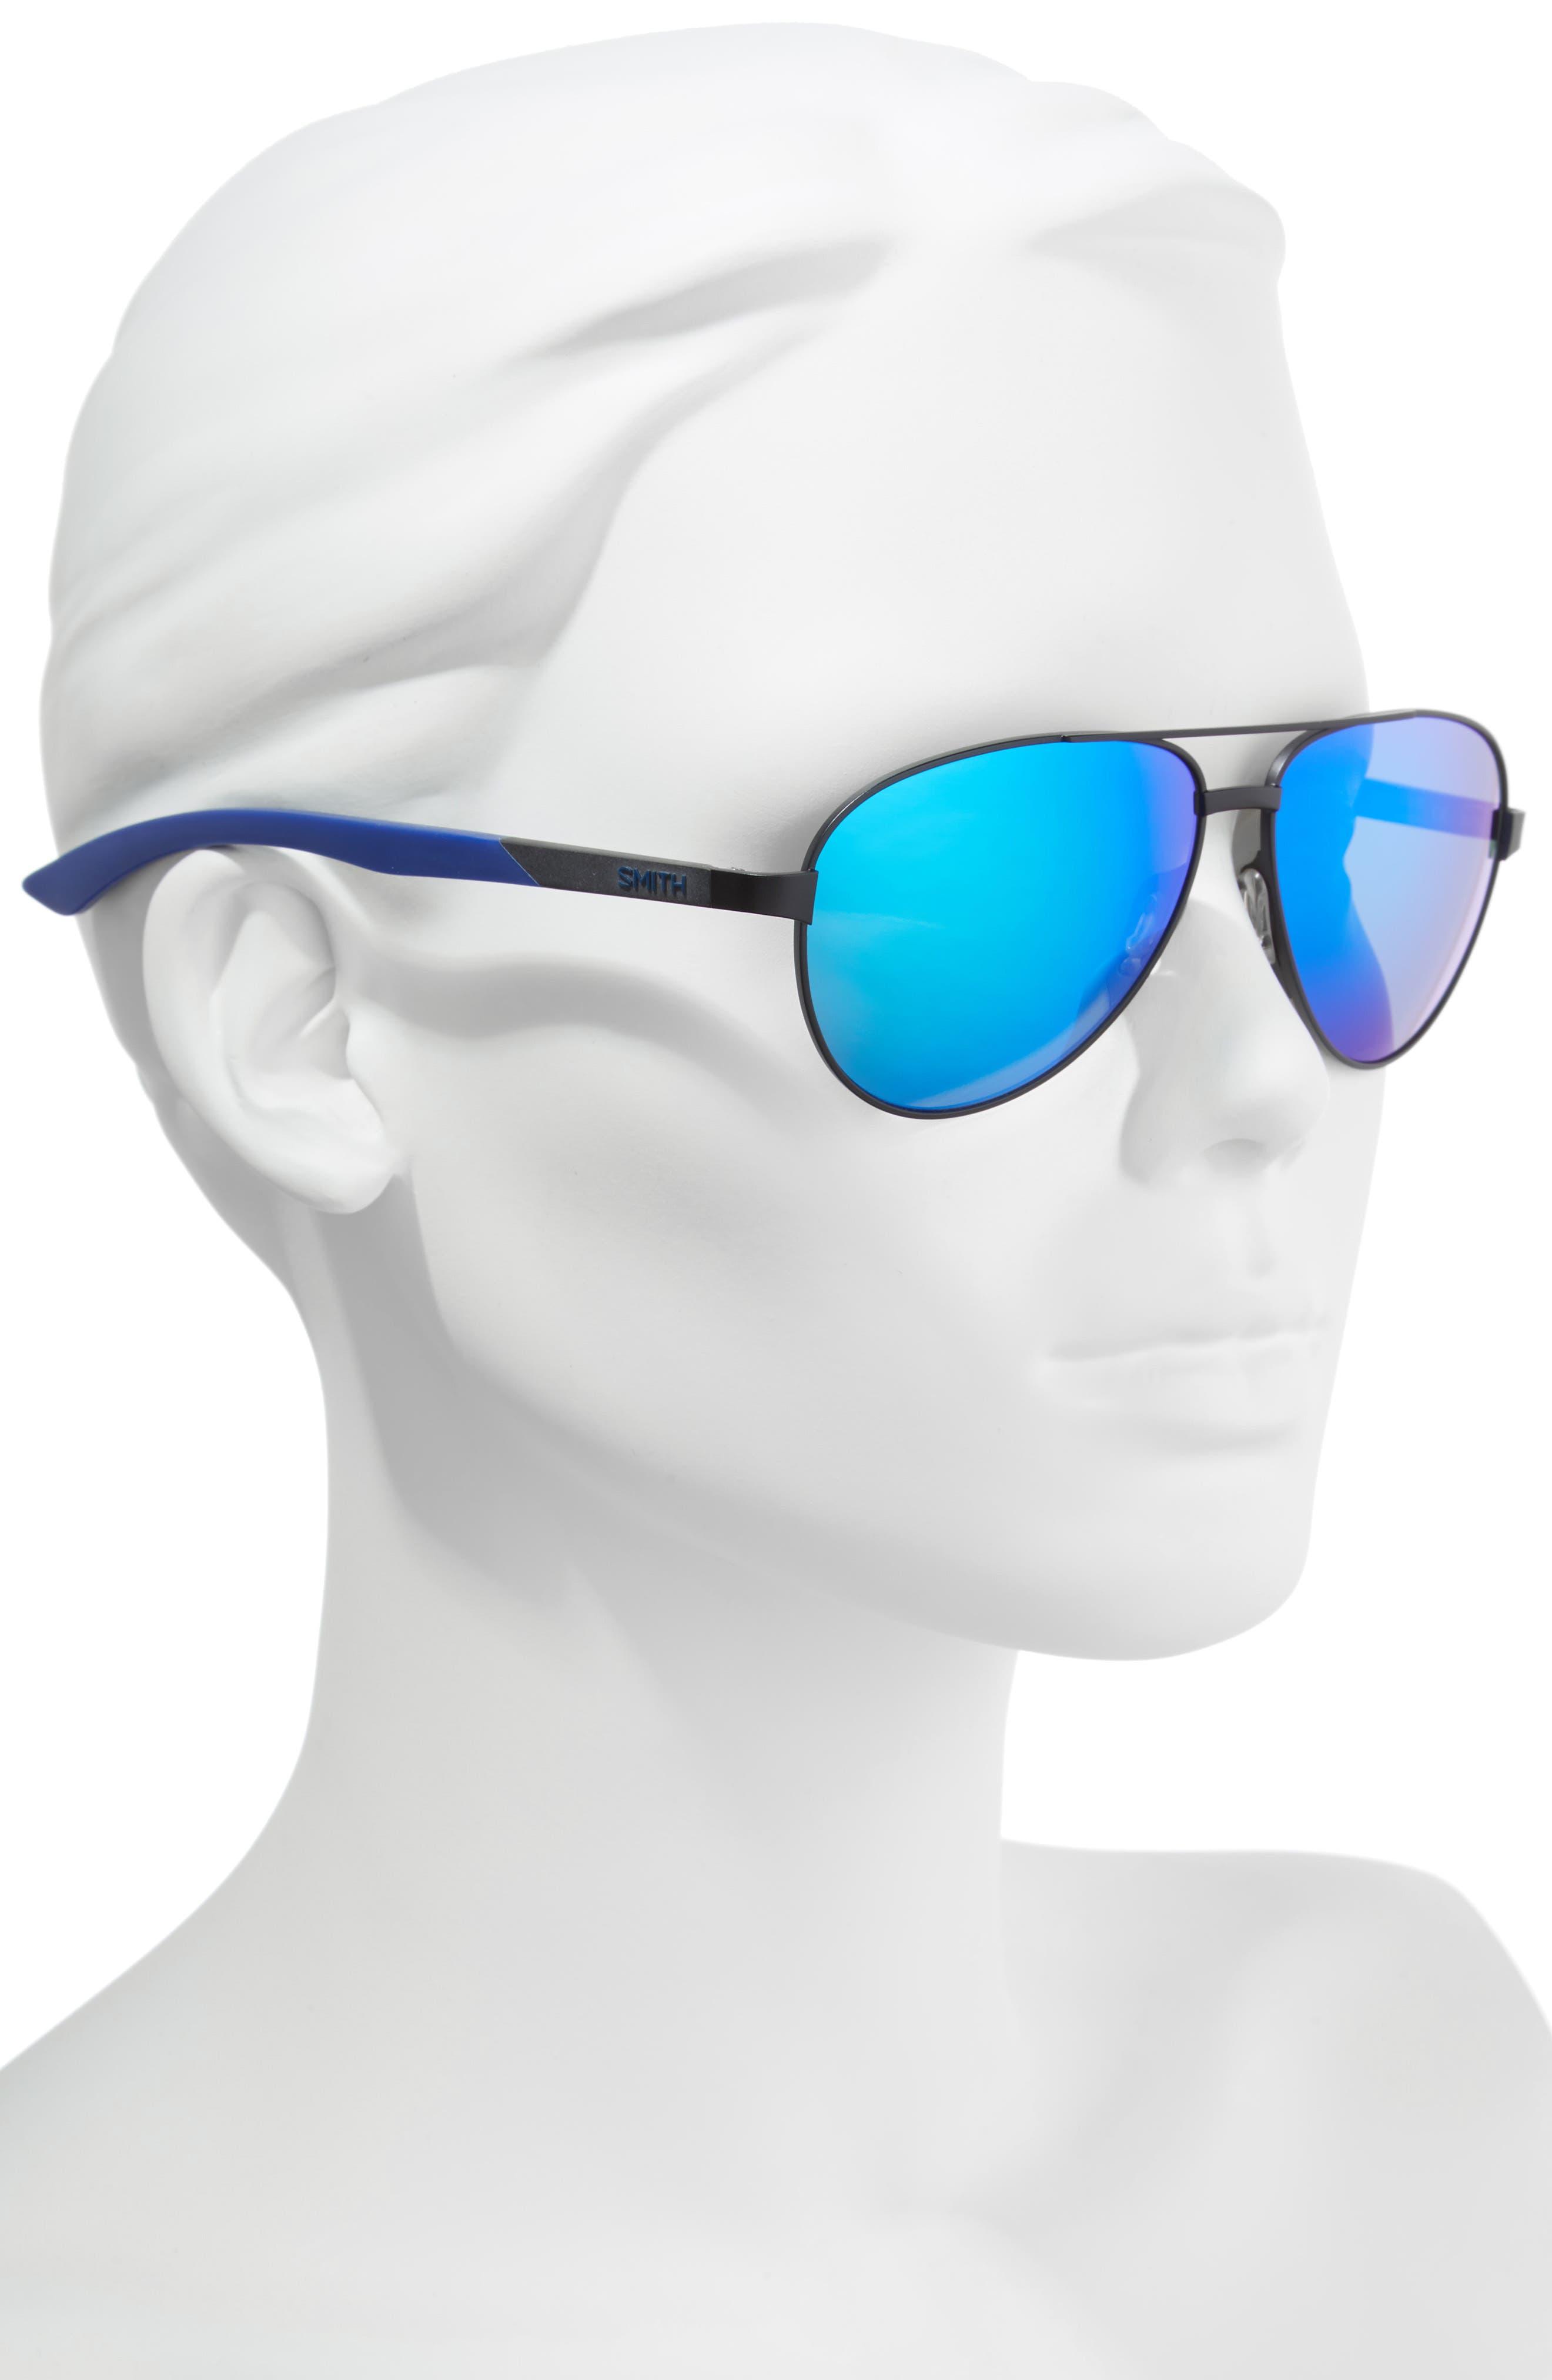 Salute 59mm Aviator Sunglasses,                             Alternate thumbnail 2, color,                             001